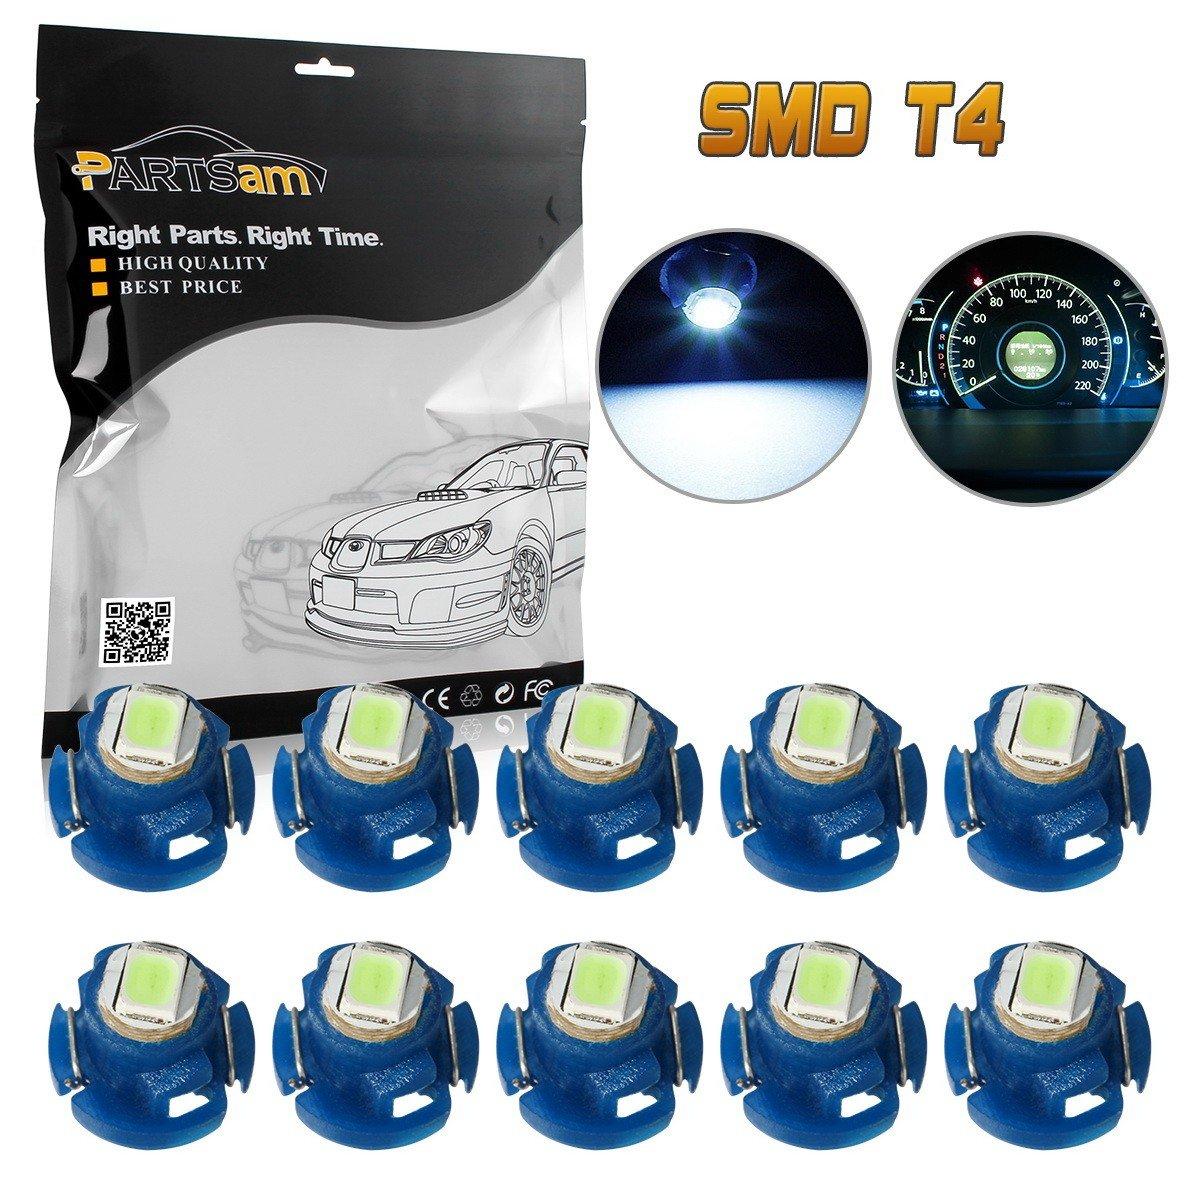 Partsam Heater A C Climate Control Dash Light Bulb Kit 2003 Saturn Lights T42 Neo Wedge Ice Blue Led Set Of 10 Bulbs Automotive